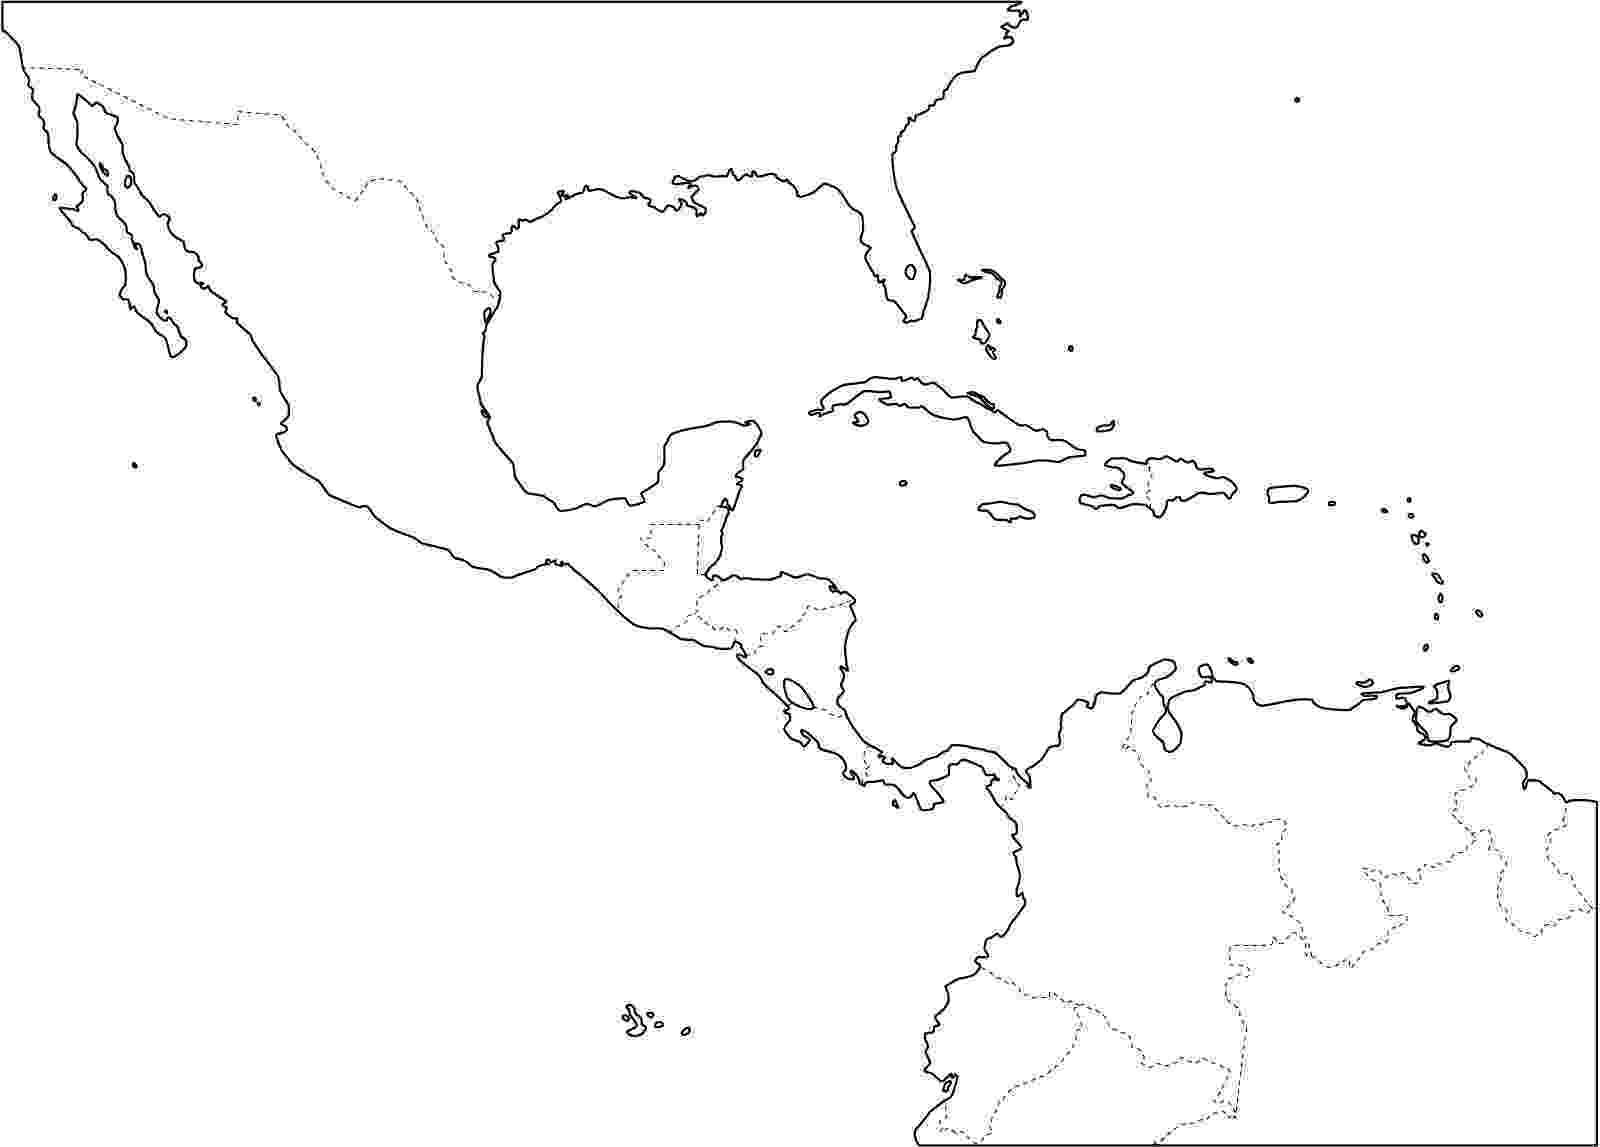 banderas de america central colouring book of flags north american and the caribbean banderas central america de